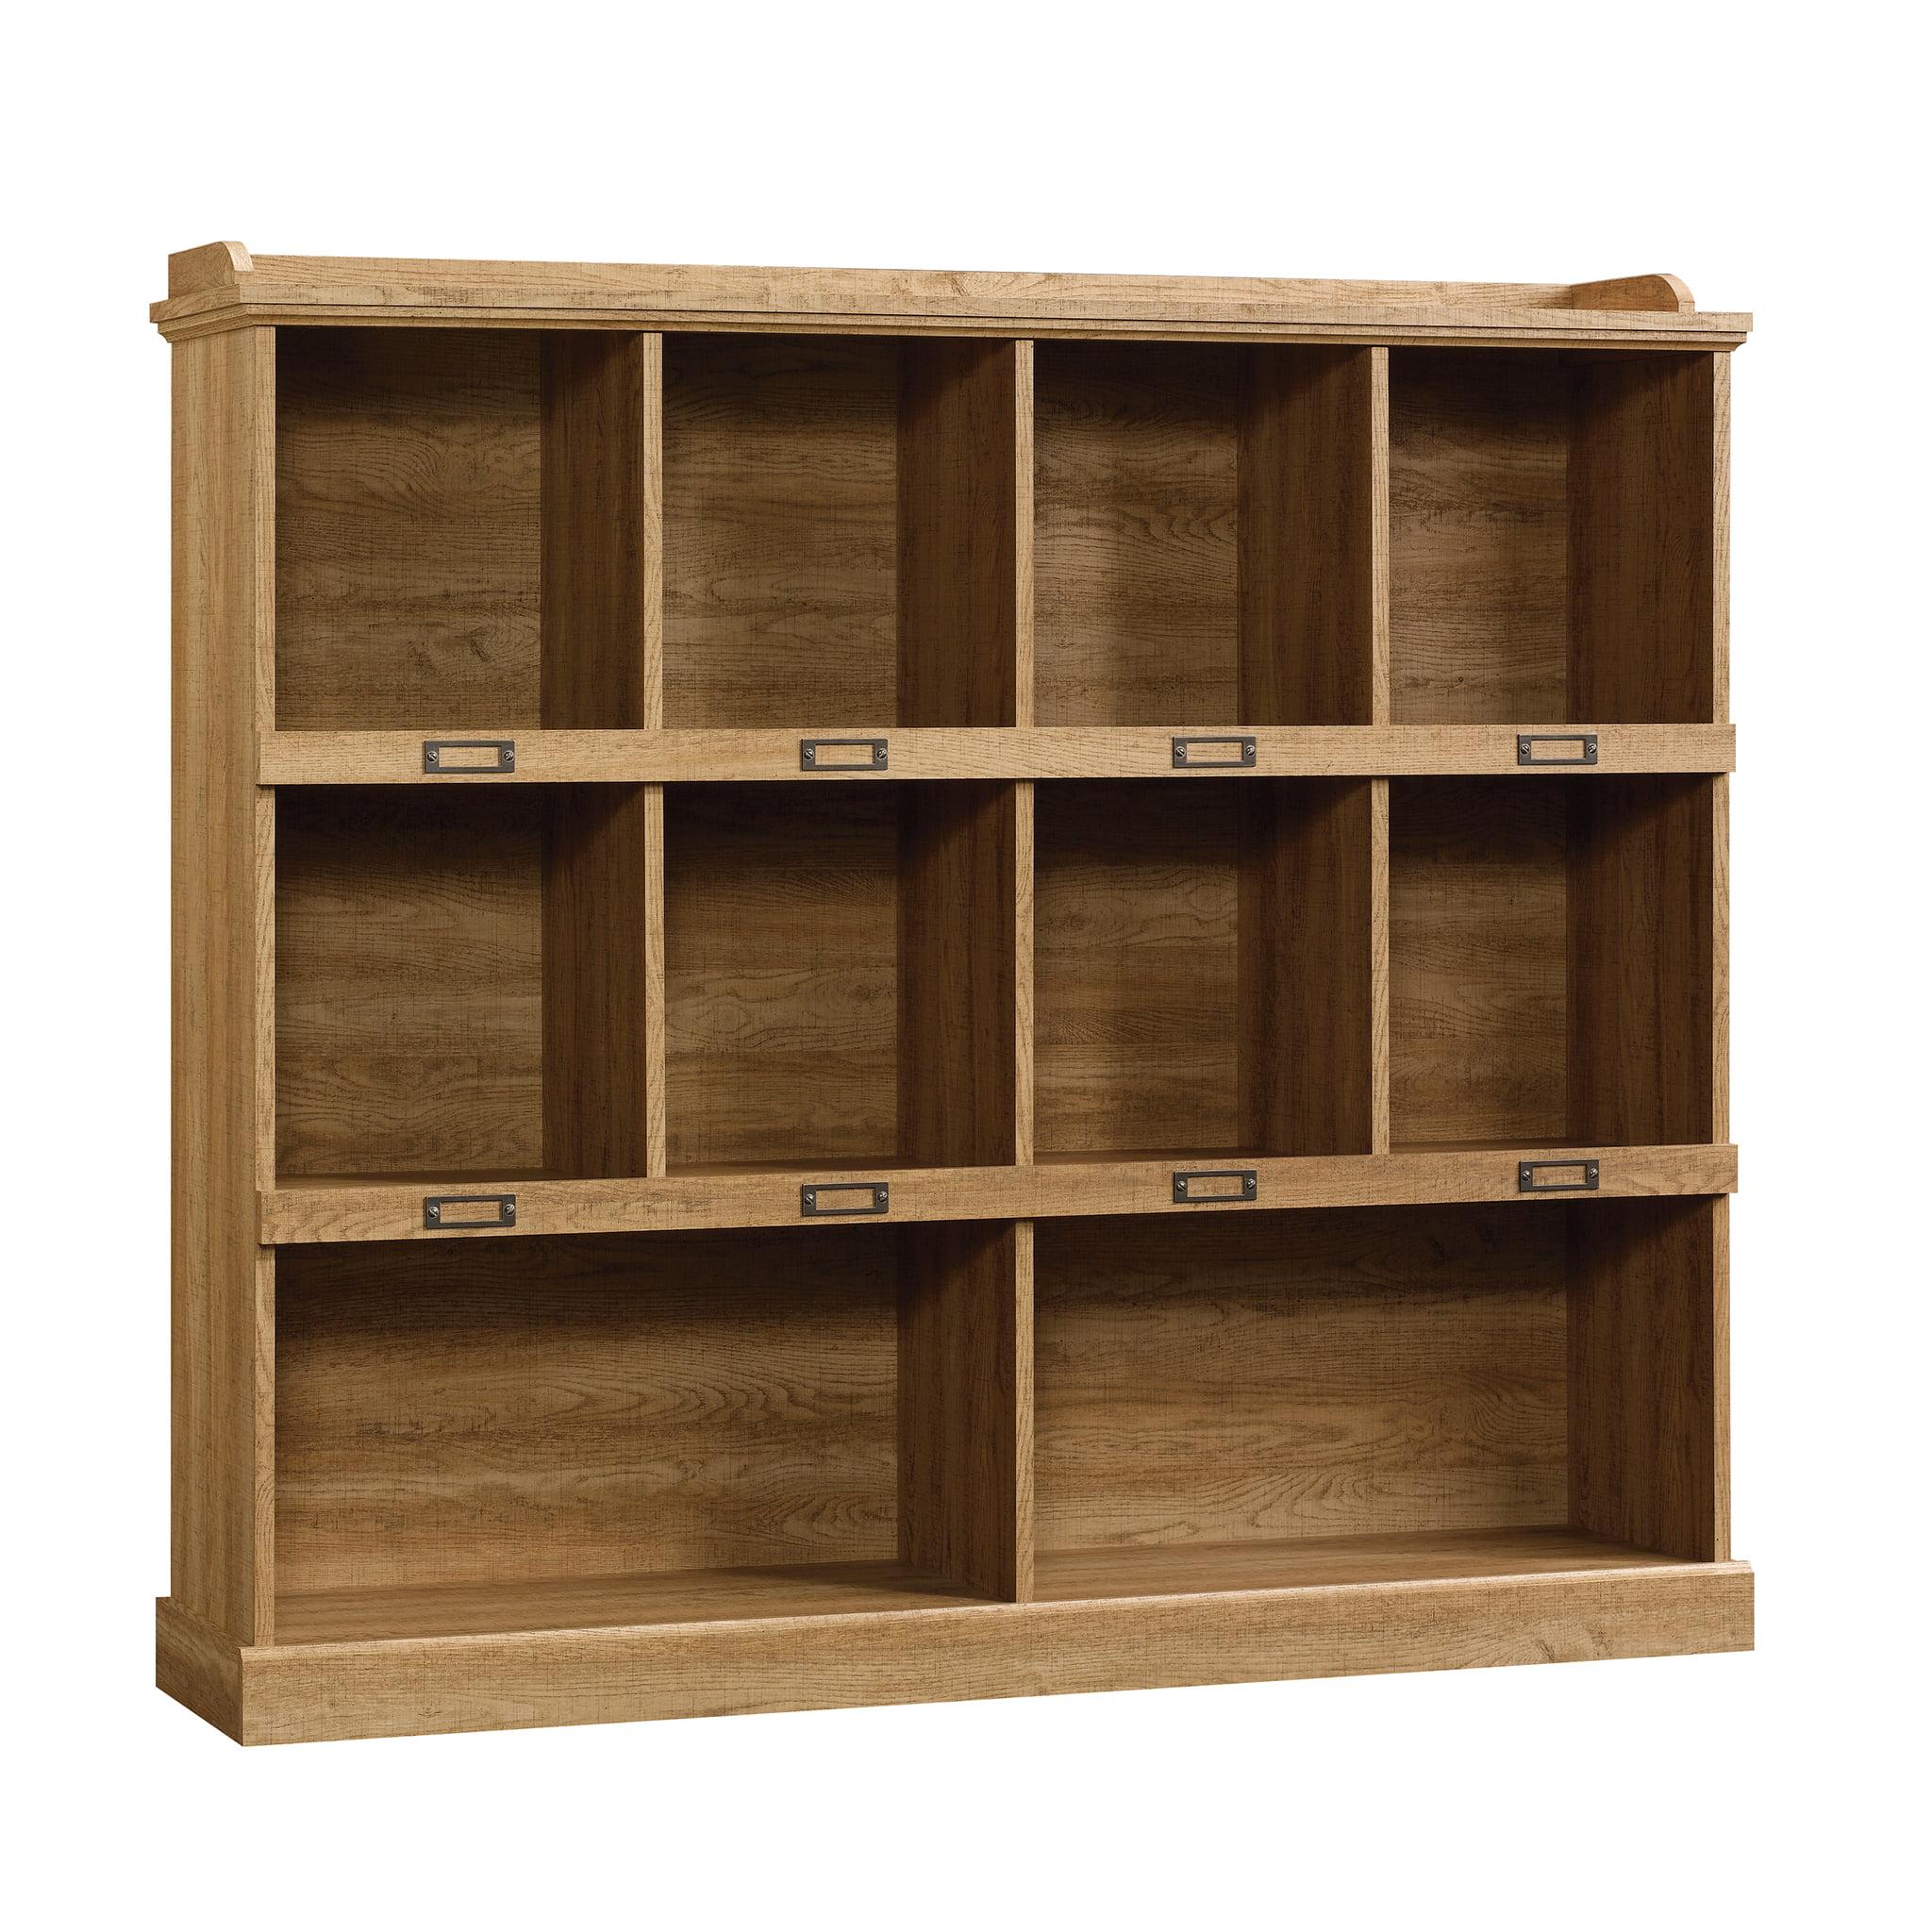 Sauder Barrister Lane Bookcase Salt Oak Finish Walmart Com